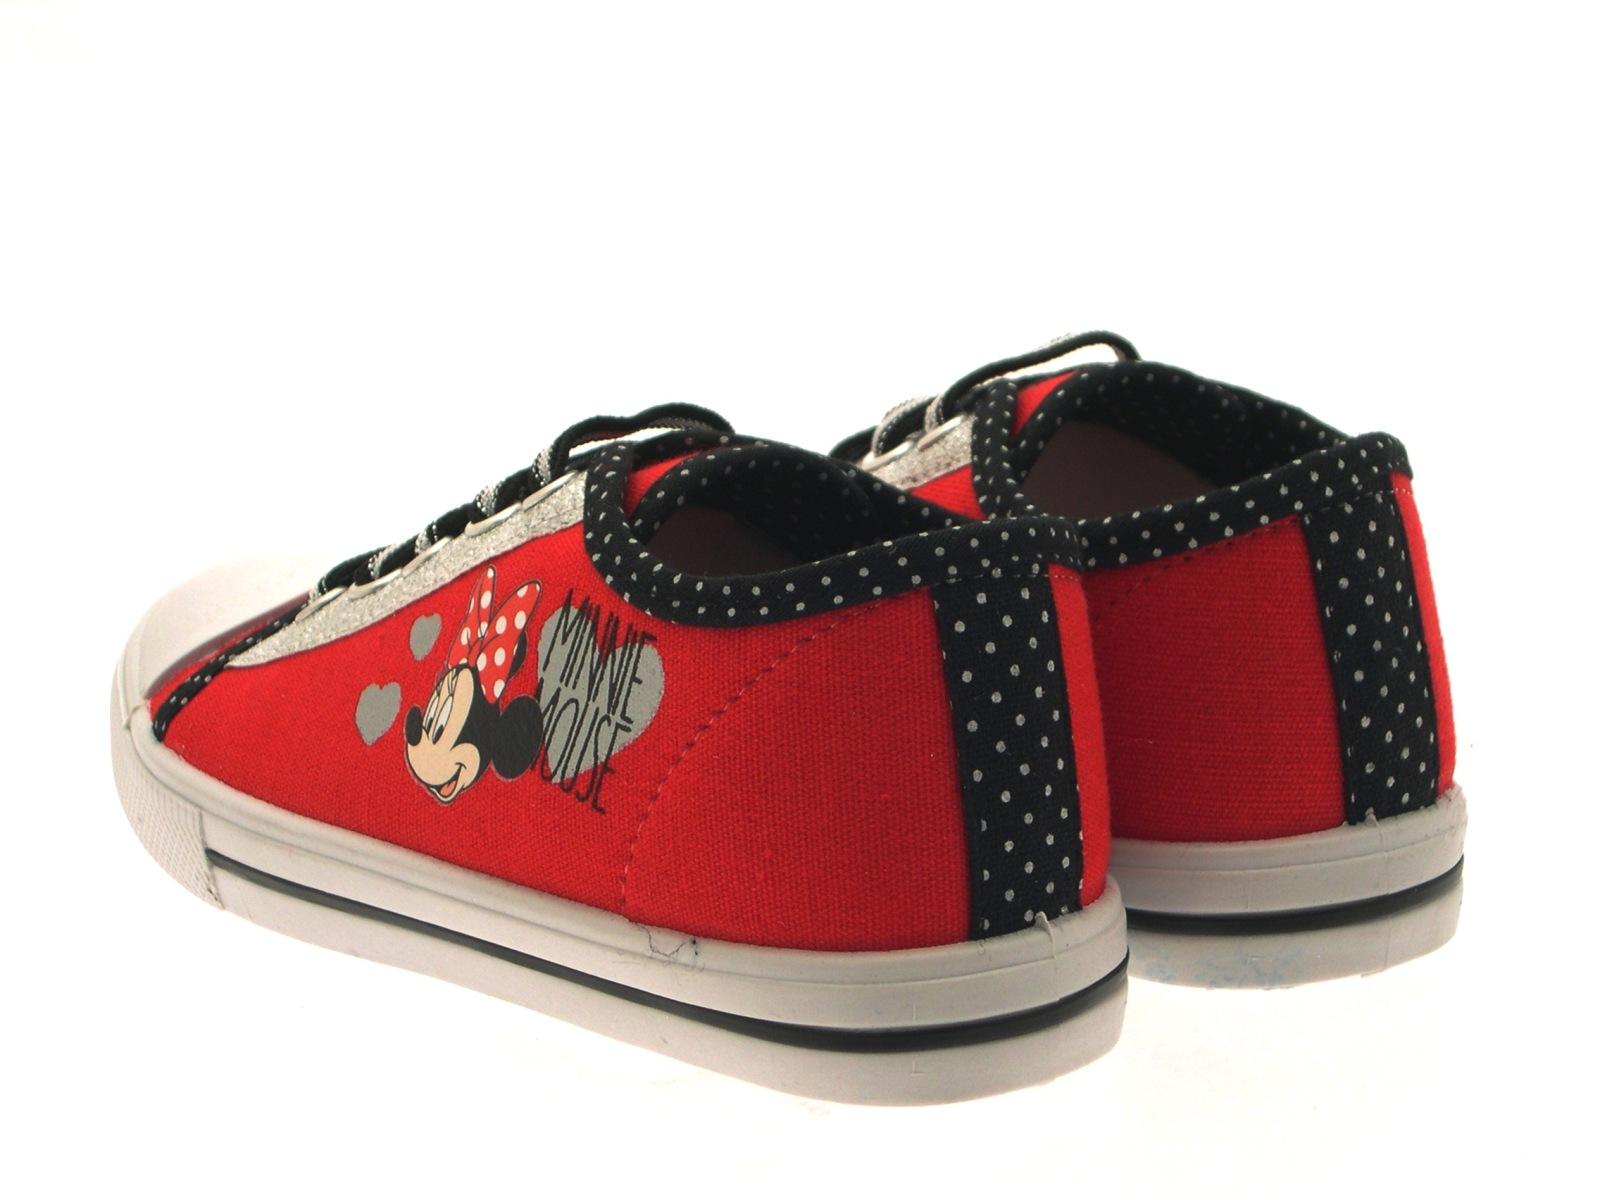 Minnie Mouse Shoes Size